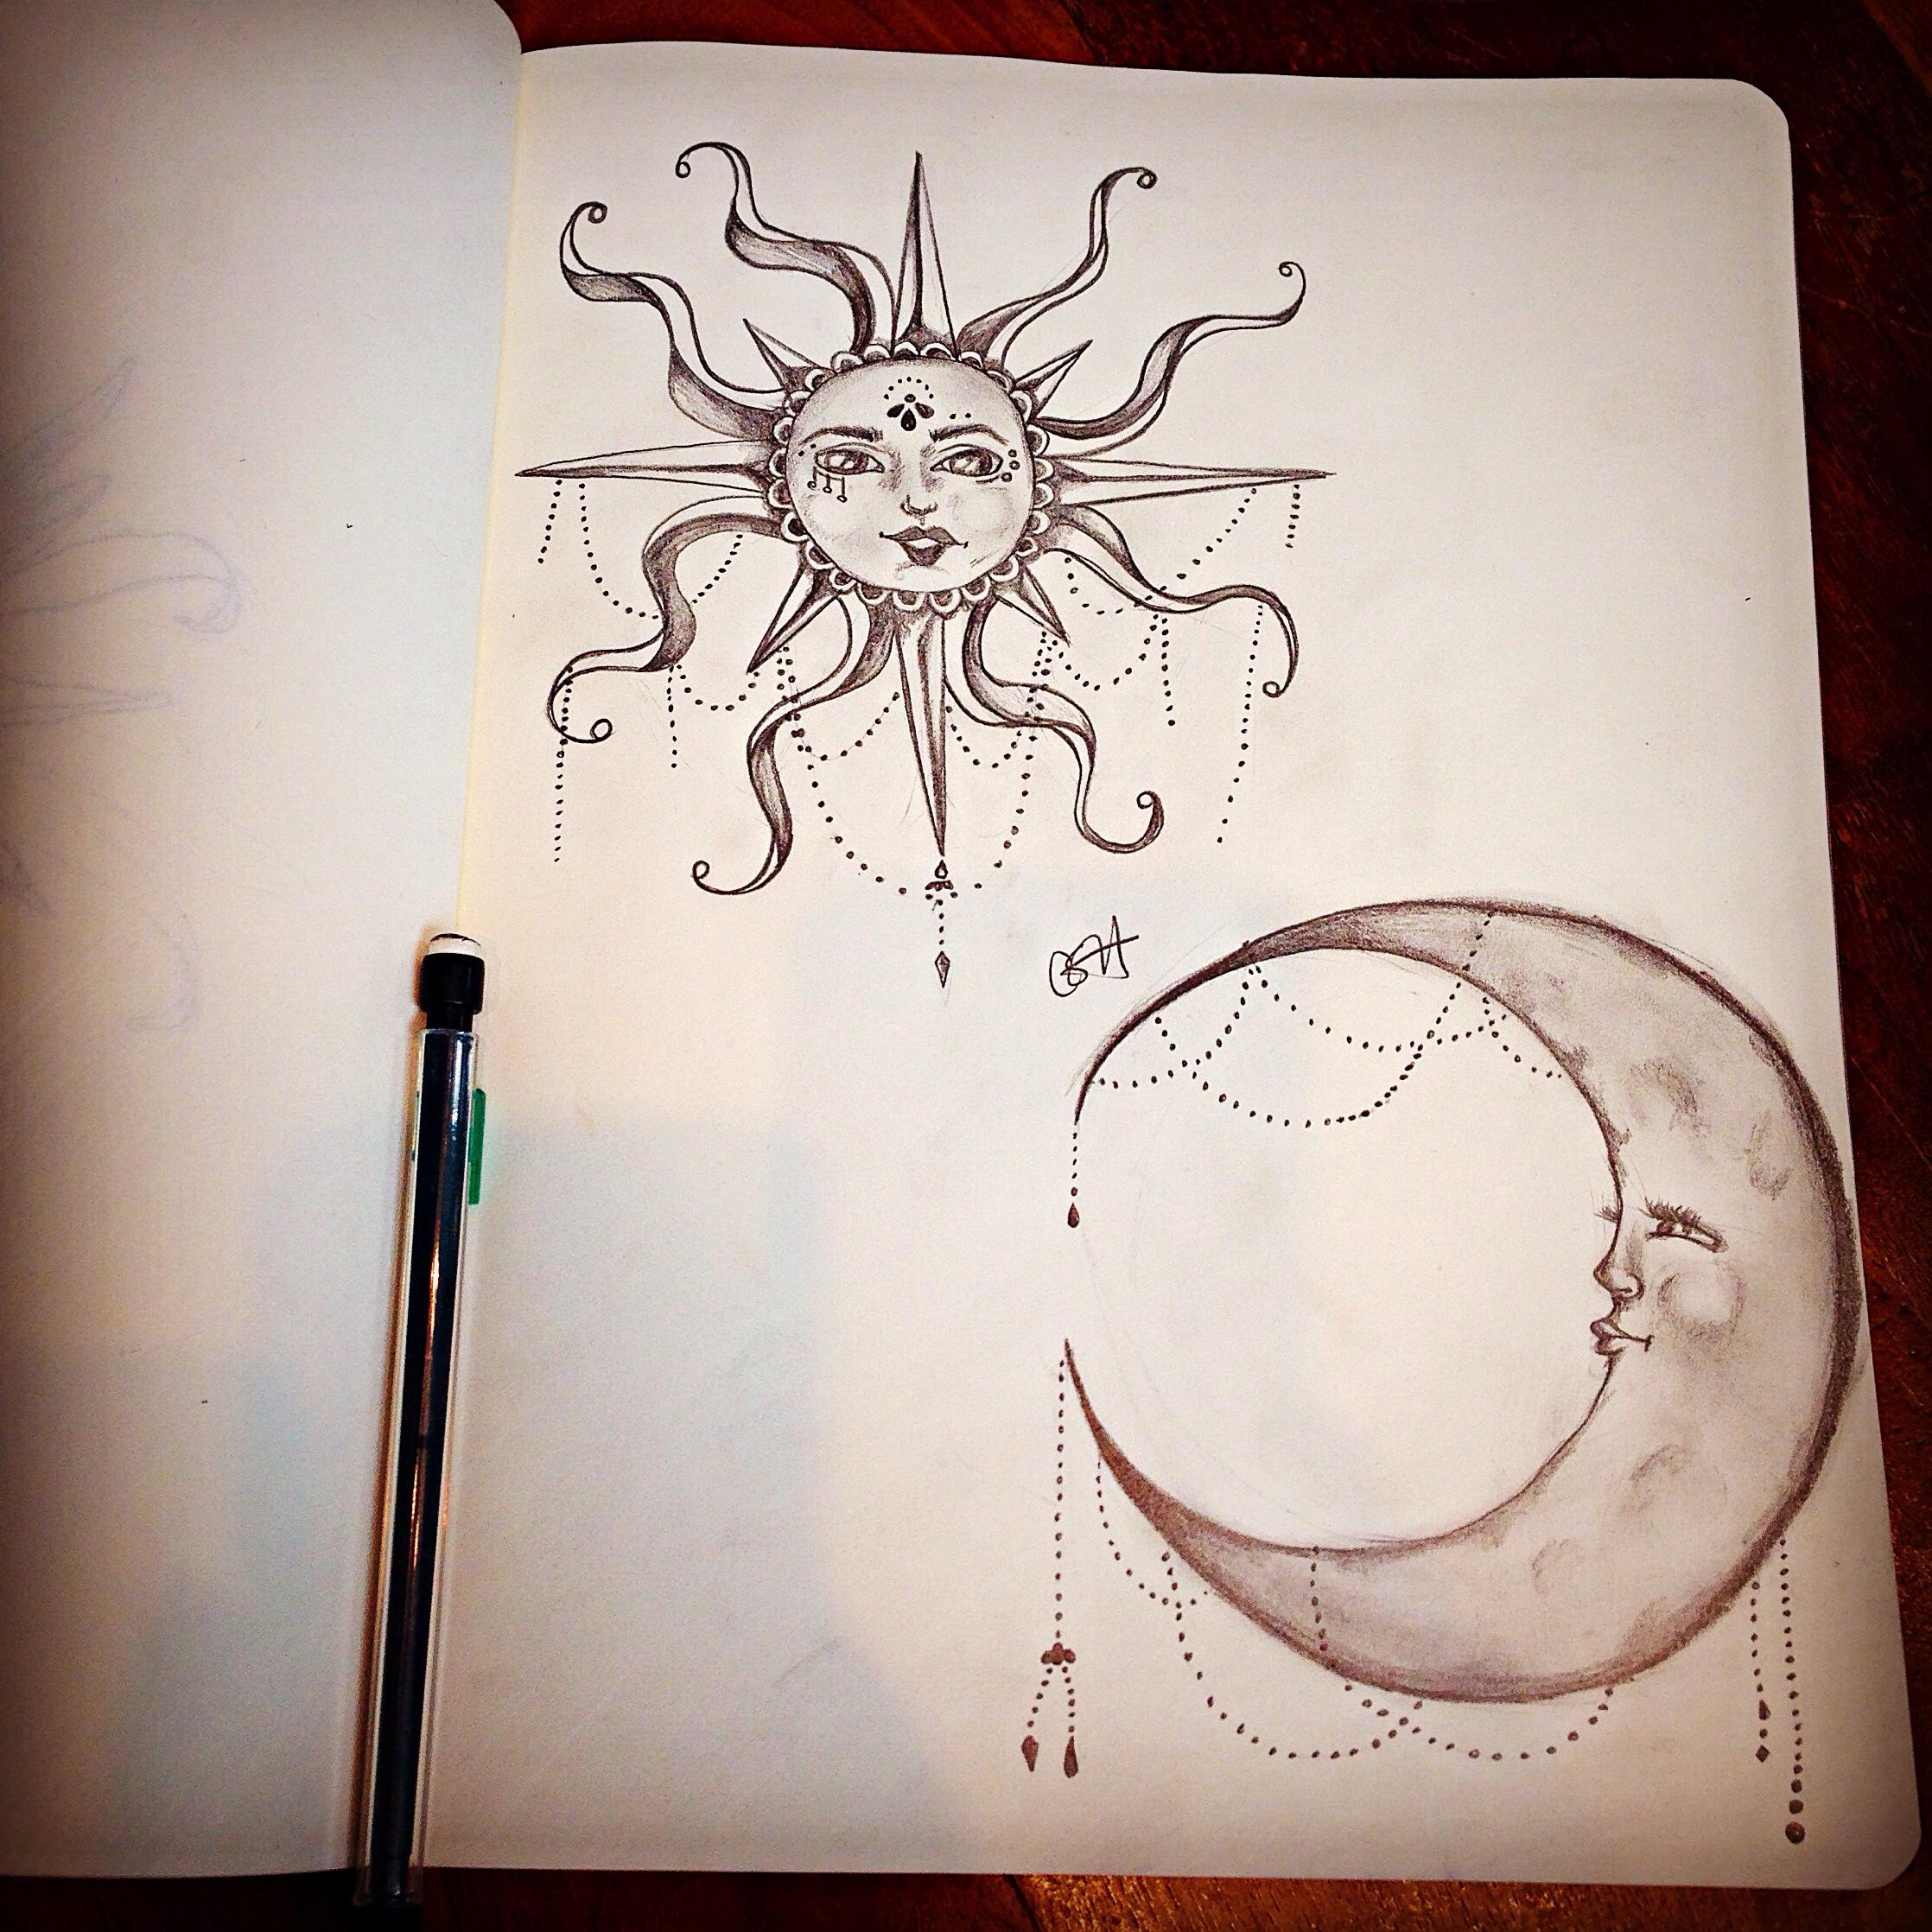 2236x2236 Moon Amp Sun Pencil Drawing The Pencil Heart Moon